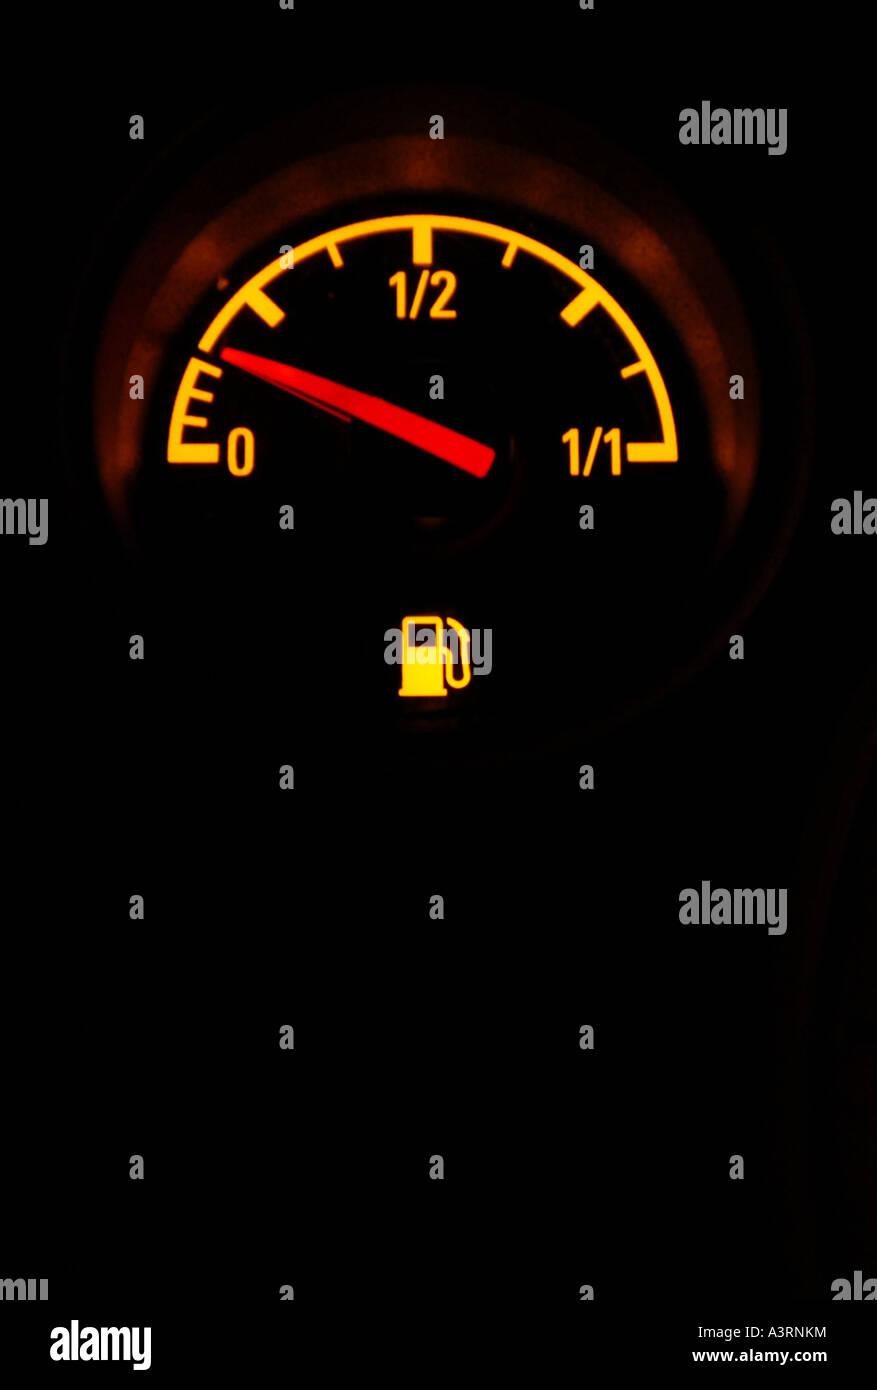 Fuel Level Stock Photos & Fuel Level Stock Images - Alamy